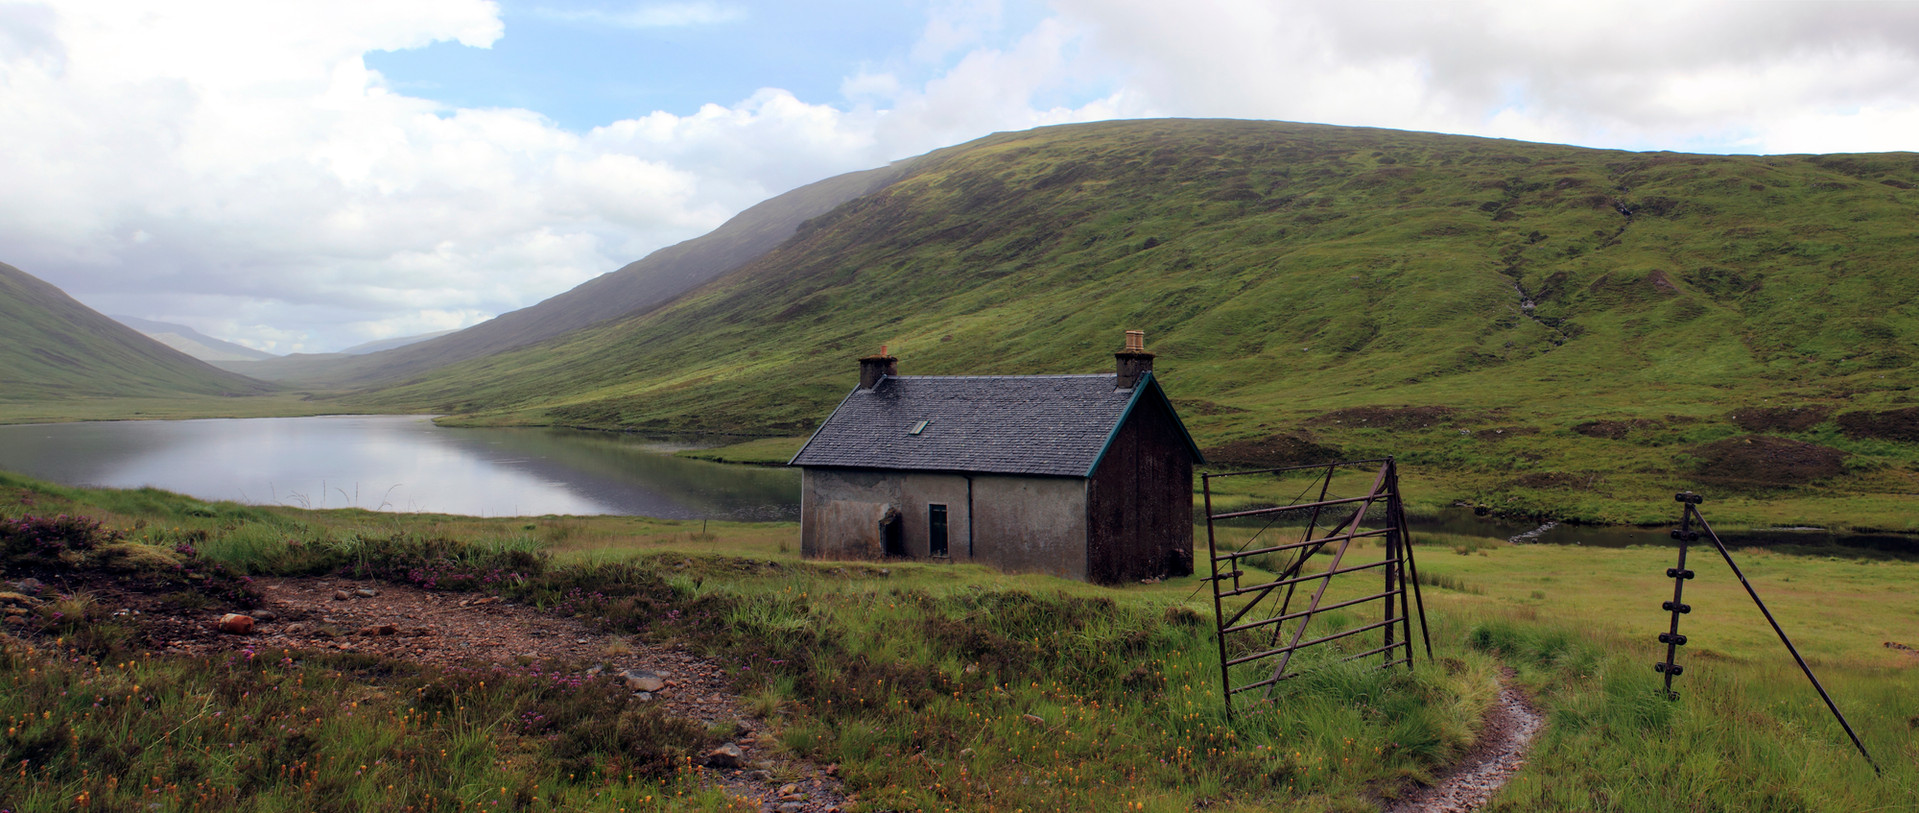 Loch Chiarain Bothy, Central Highlands